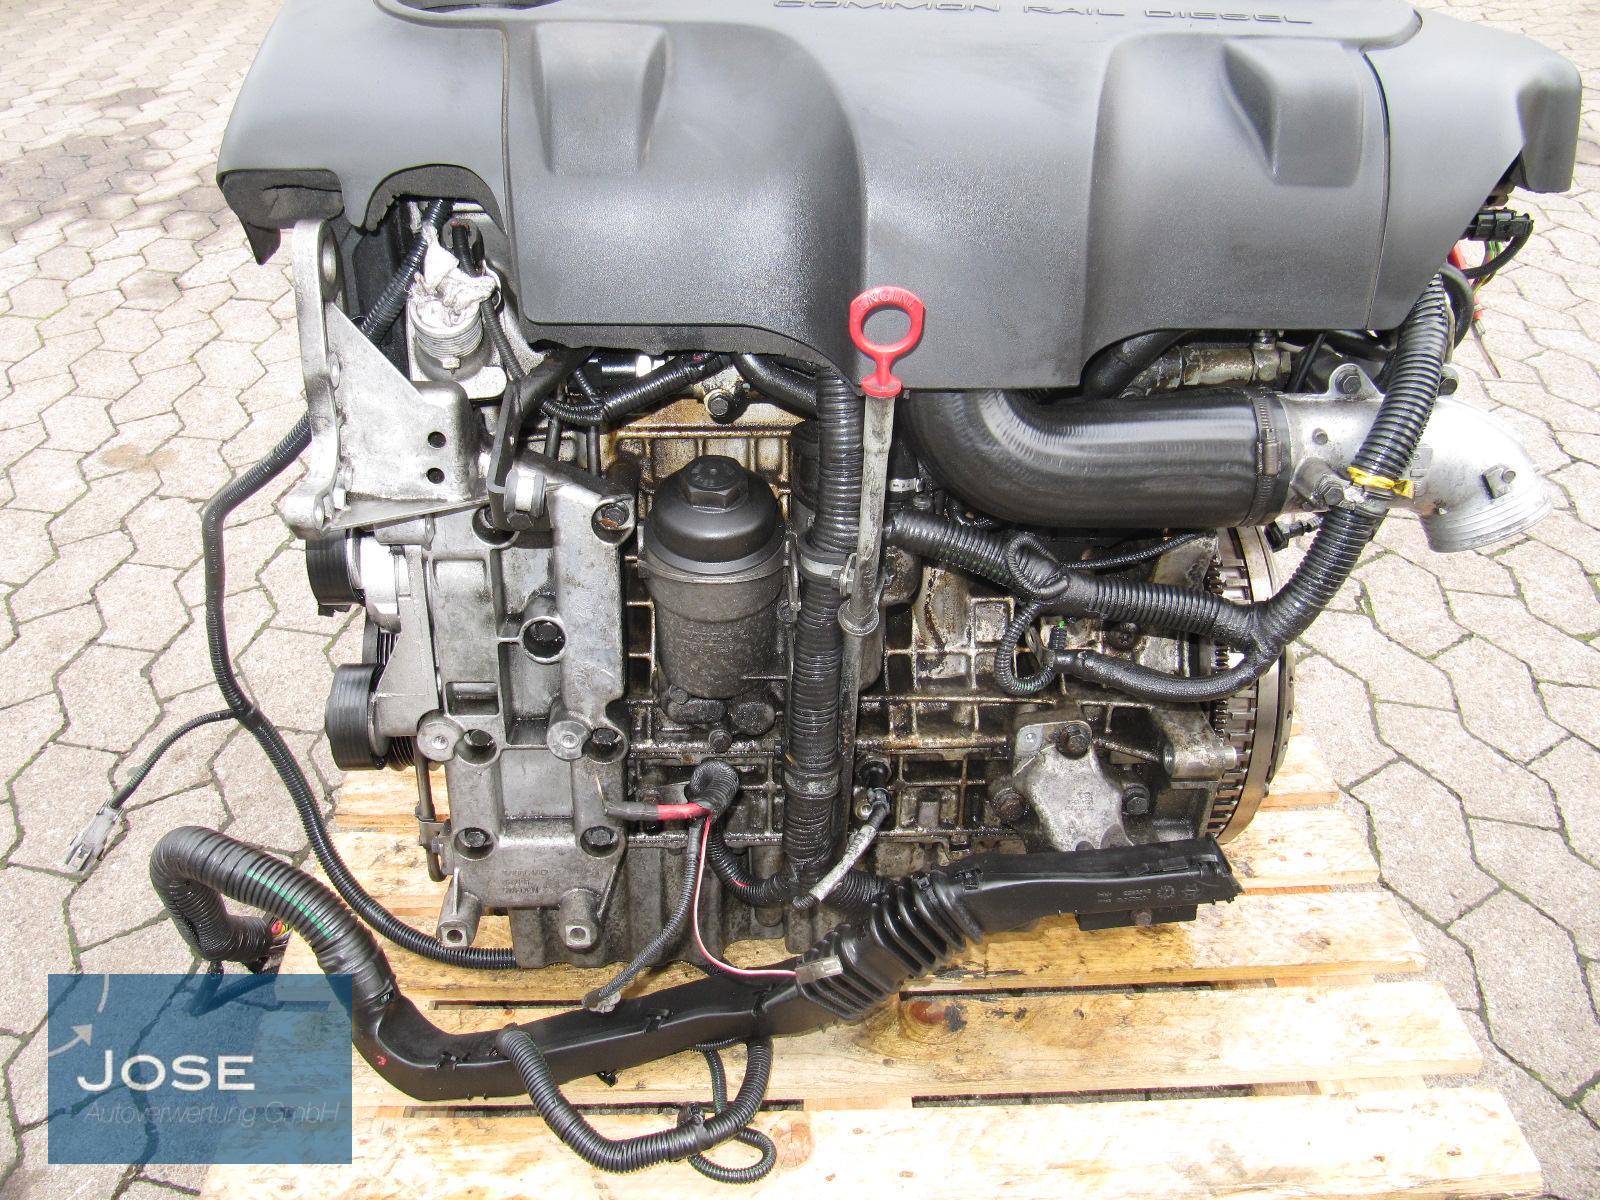 top motor dieselmotor d5244t t2 volvo s60 2 4 d5 120kw. Black Bedroom Furniture Sets. Home Design Ideas